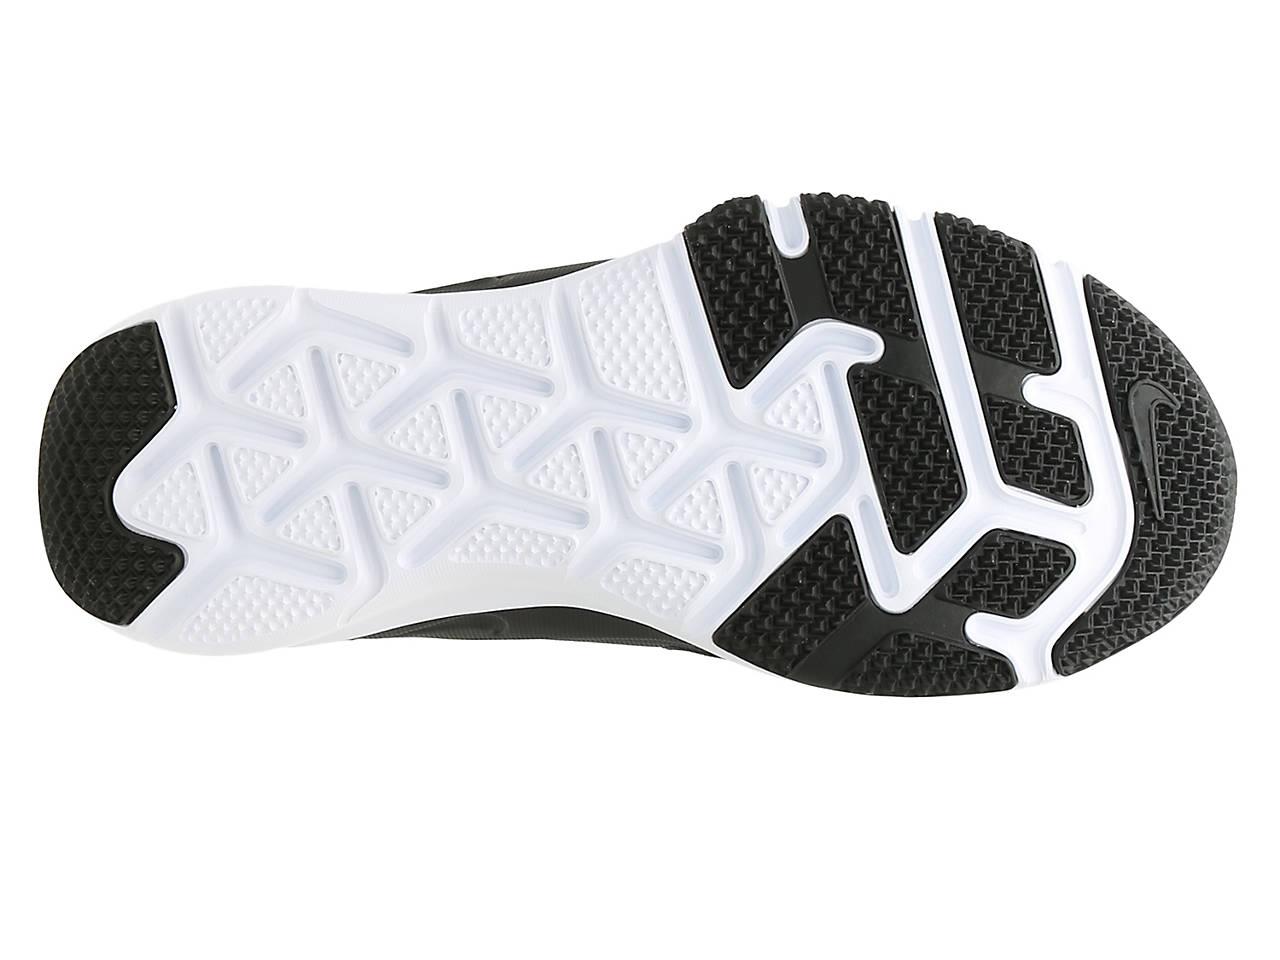 edb381338c515 Nike Flex Control TR 3 4E Training Shoe - Men s Men s Shoes